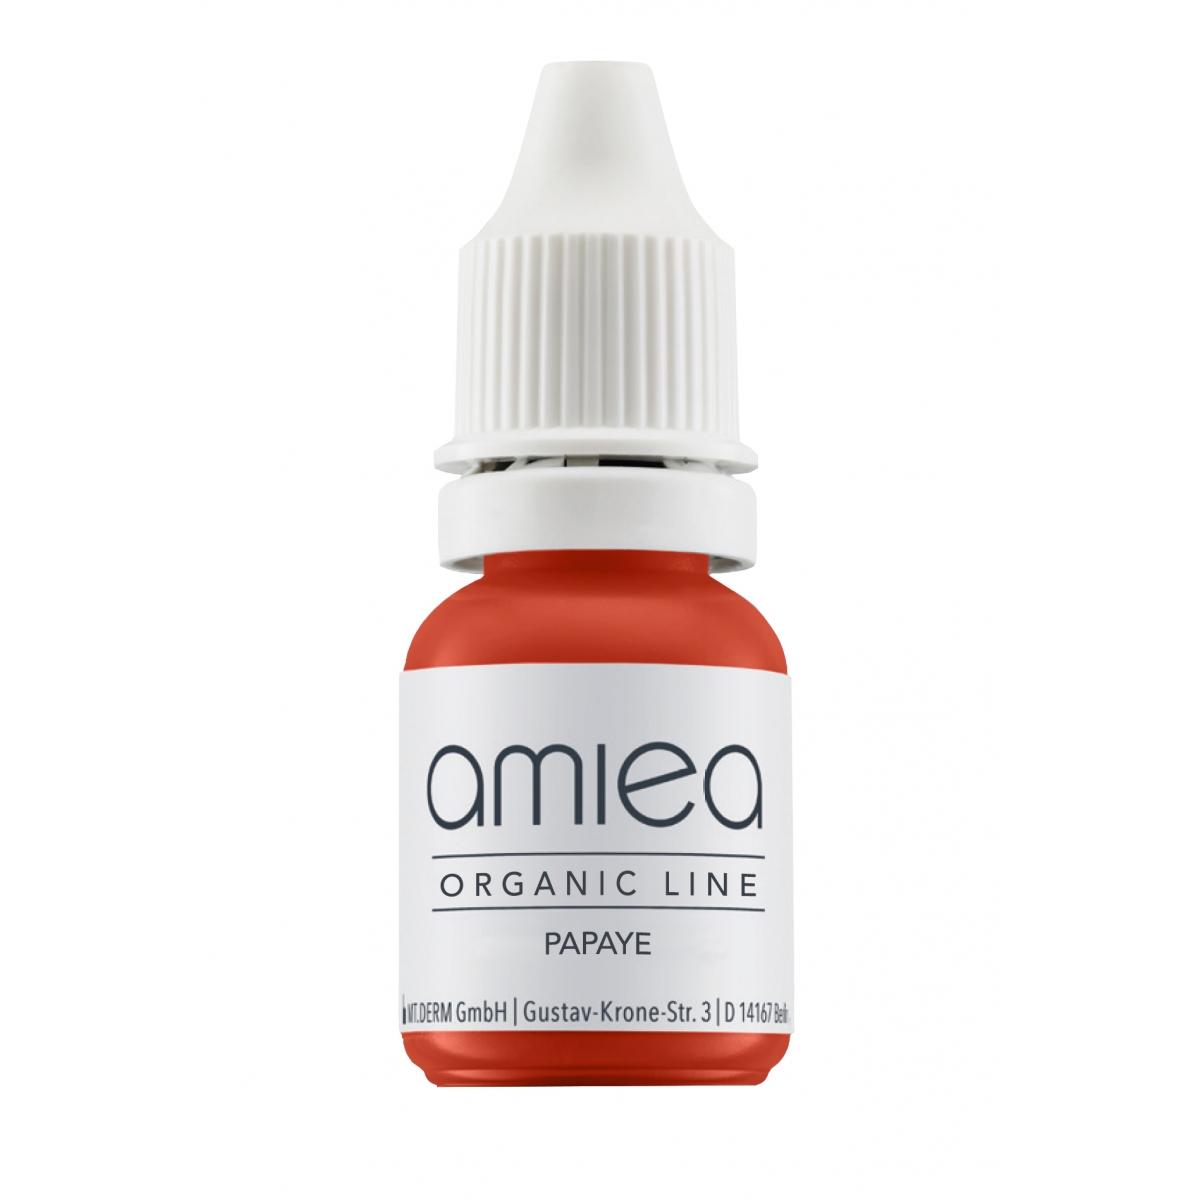 ORGANIC LINE (10ml) - PIGMENT PAPAYE ORGANICLINE AMIEA (10 ml)